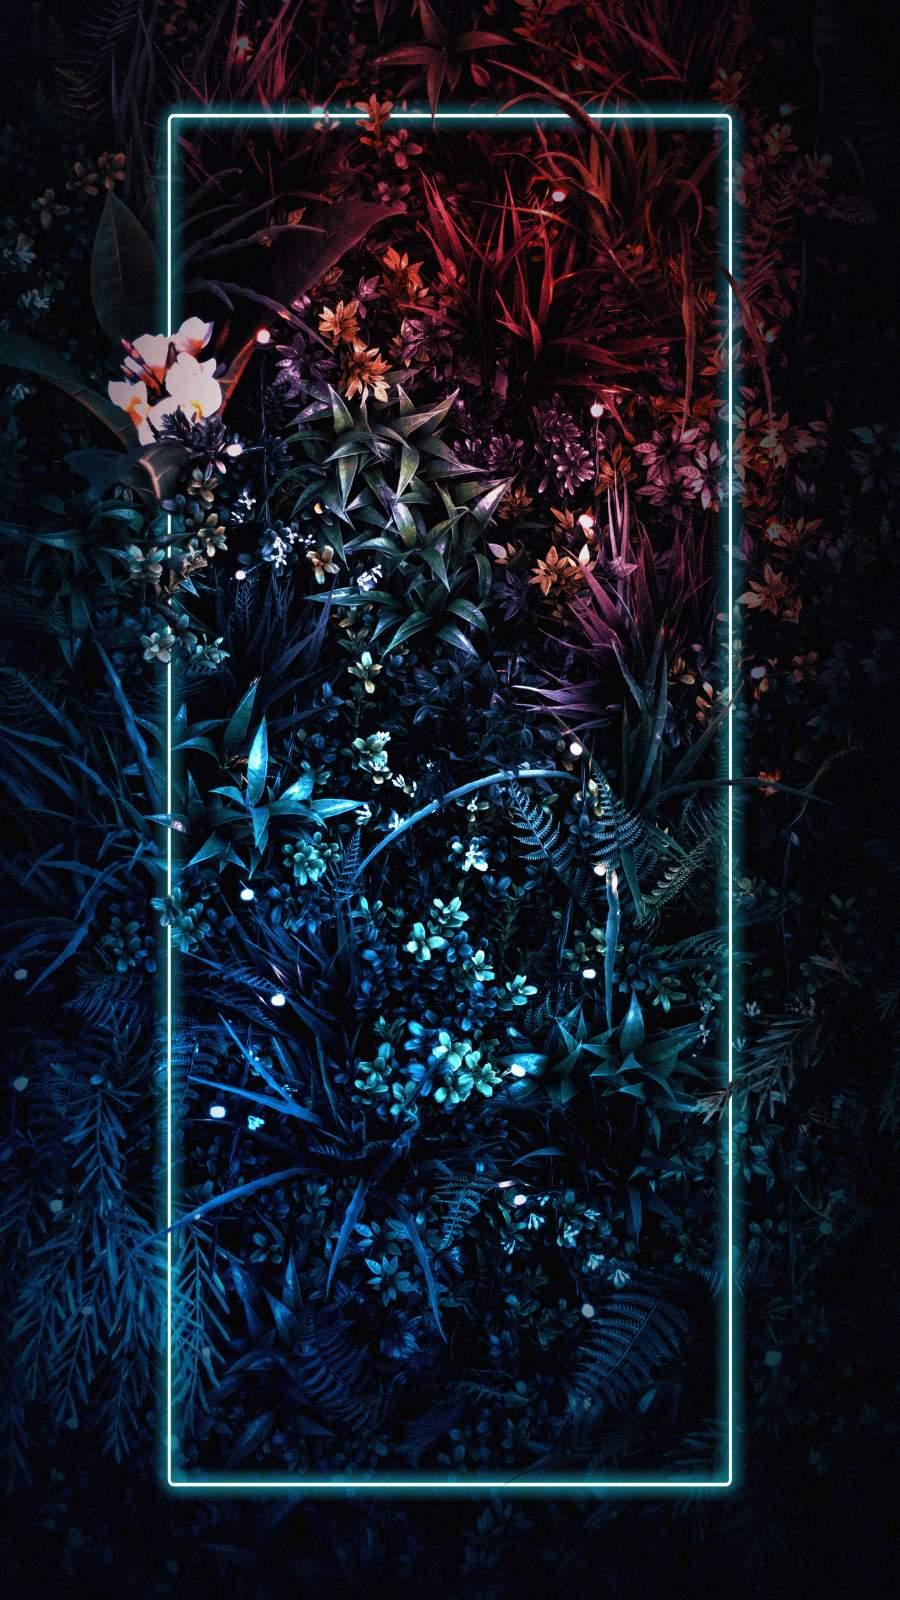 Neon Light Plants Nature